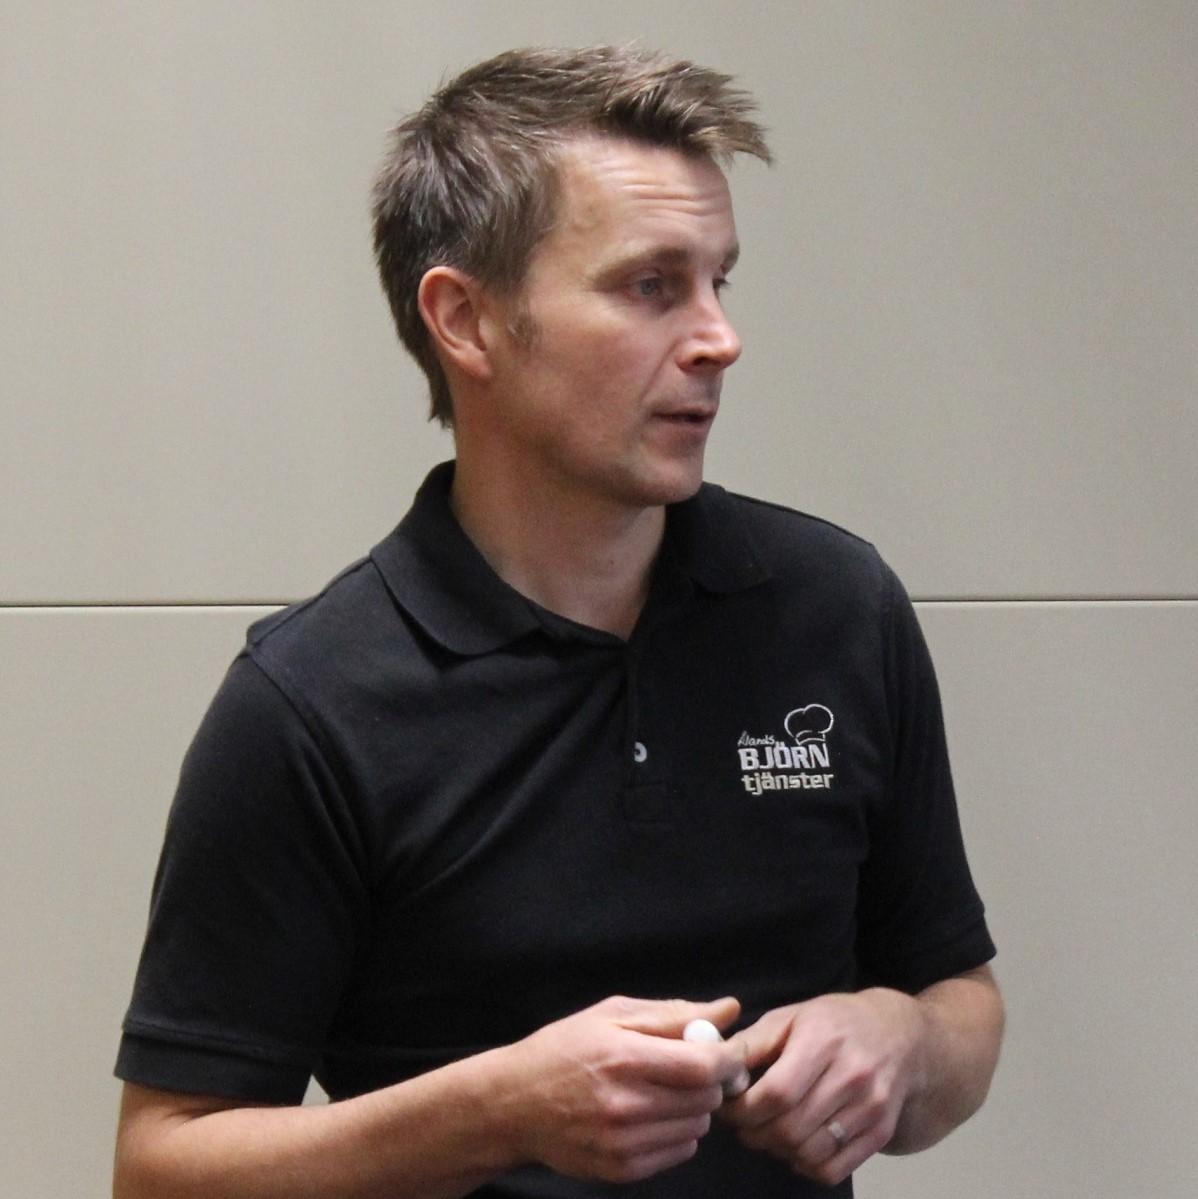 Björn Ekstrand